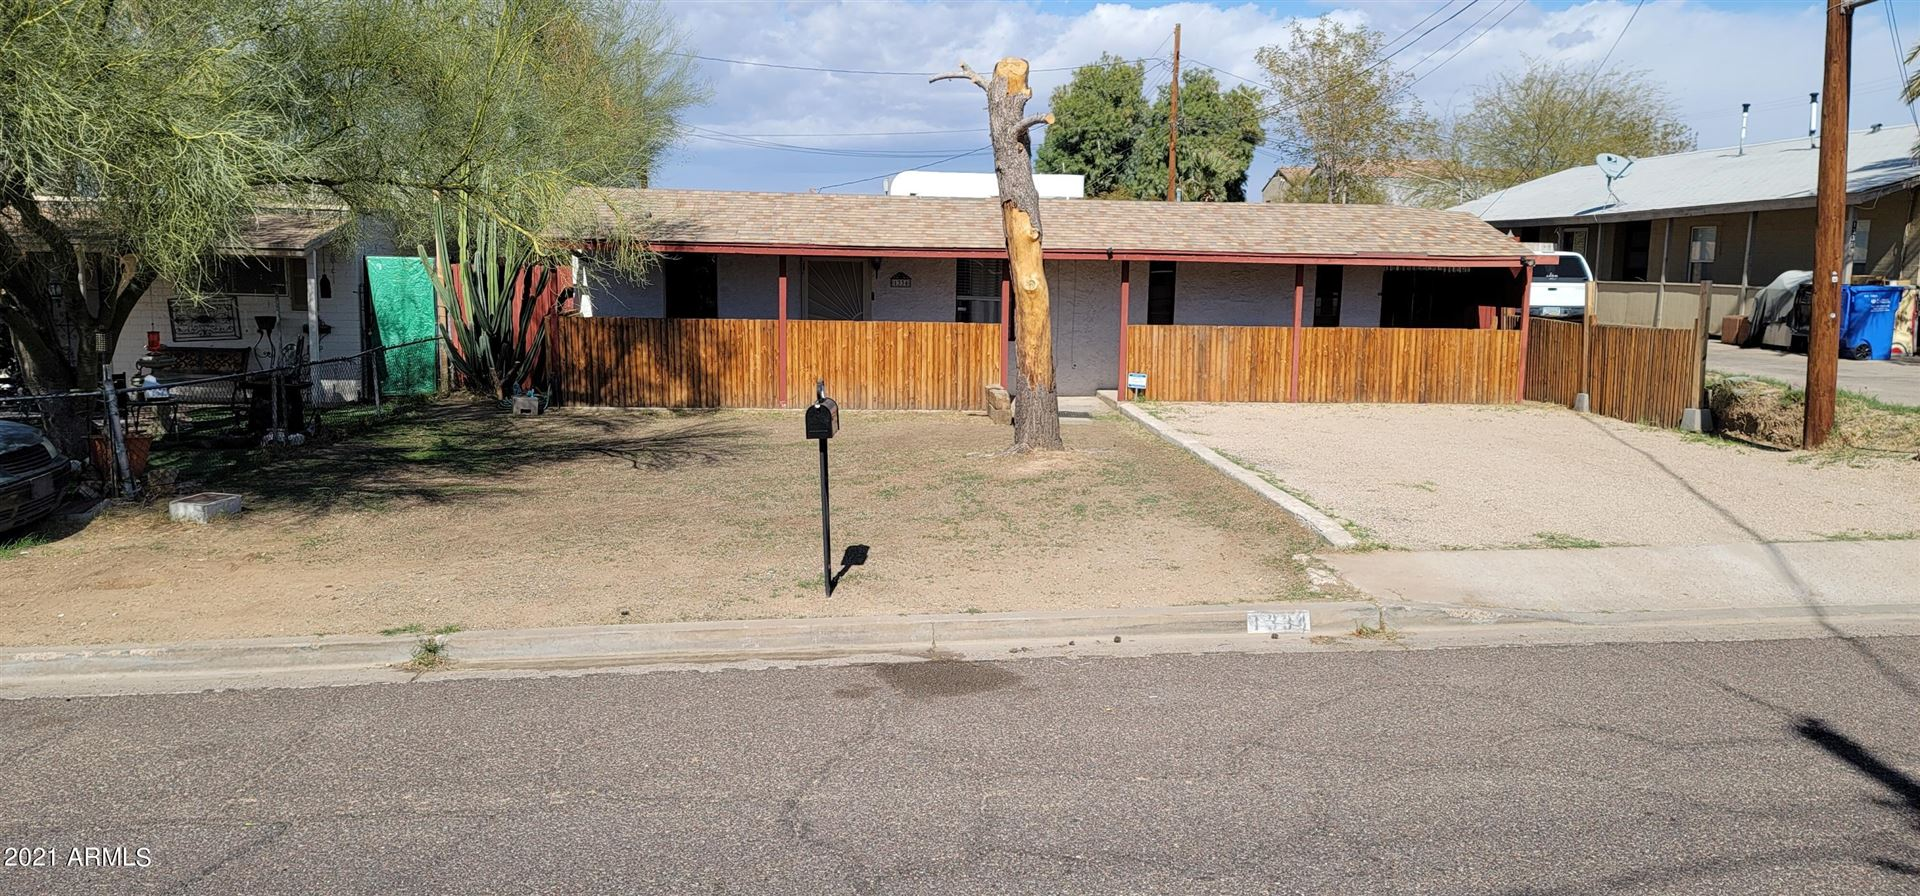 1334 E CINNABAR Avenue, Phoenix, AZ 85020 - MLS#: 6195414